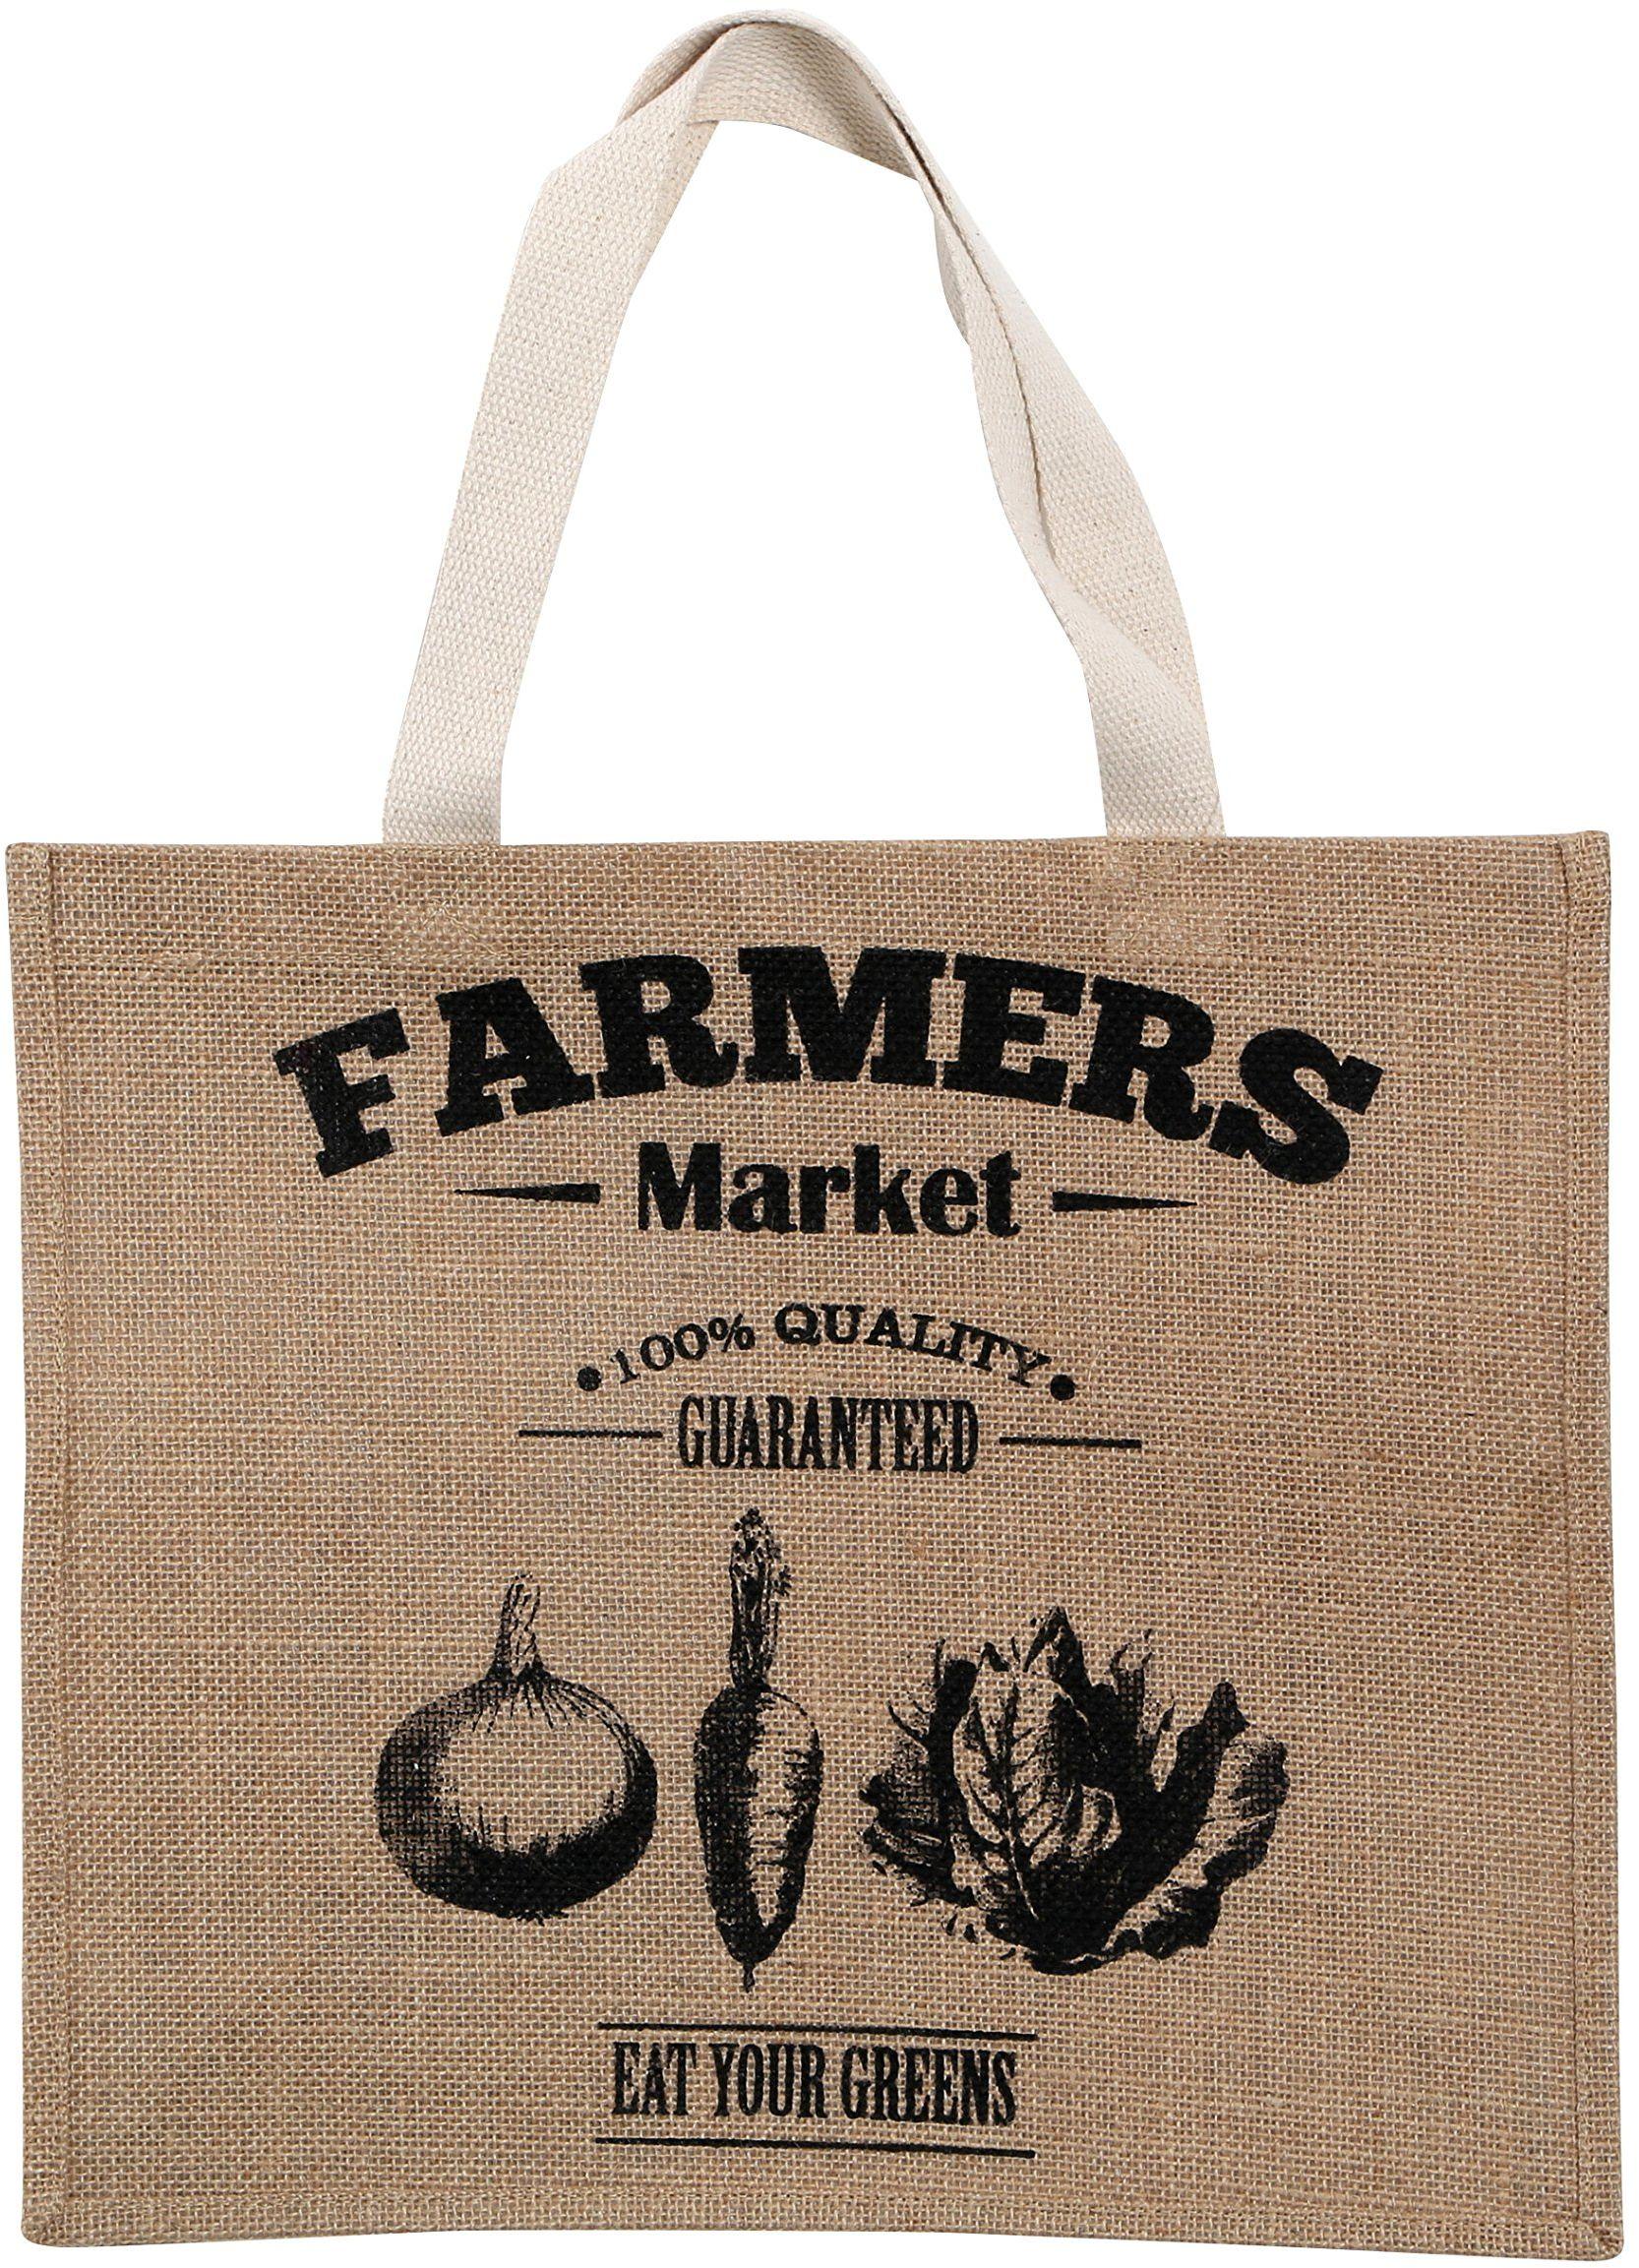 Premier Bauernmarkt torba na zakupy, juta, Heasian, bawełna, naturalna, czarna